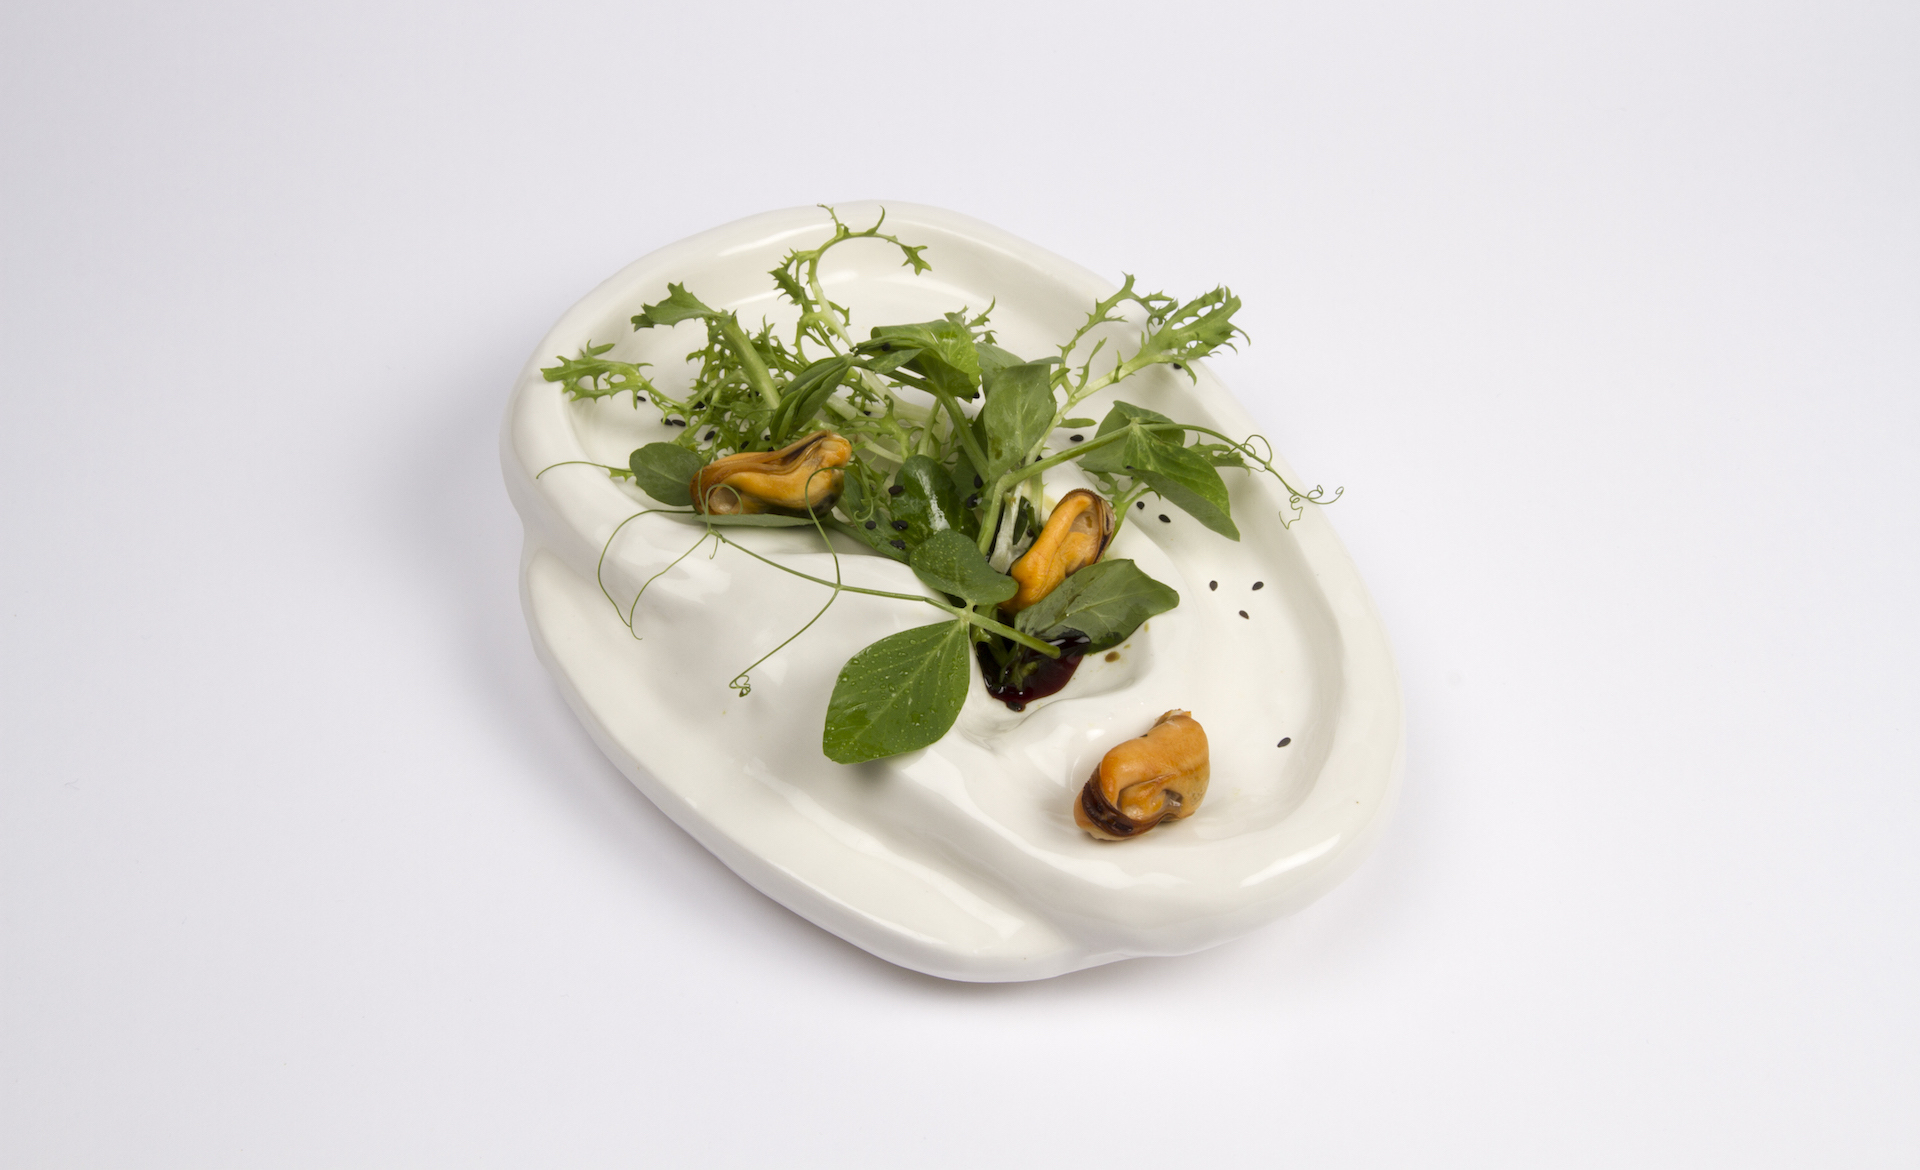 Soft and Easy Pleasure (Ear Salad)   Mussels, pea sprouts, frisée lettuce, pumpkinseed oil, lemon, vinegar, porcelain